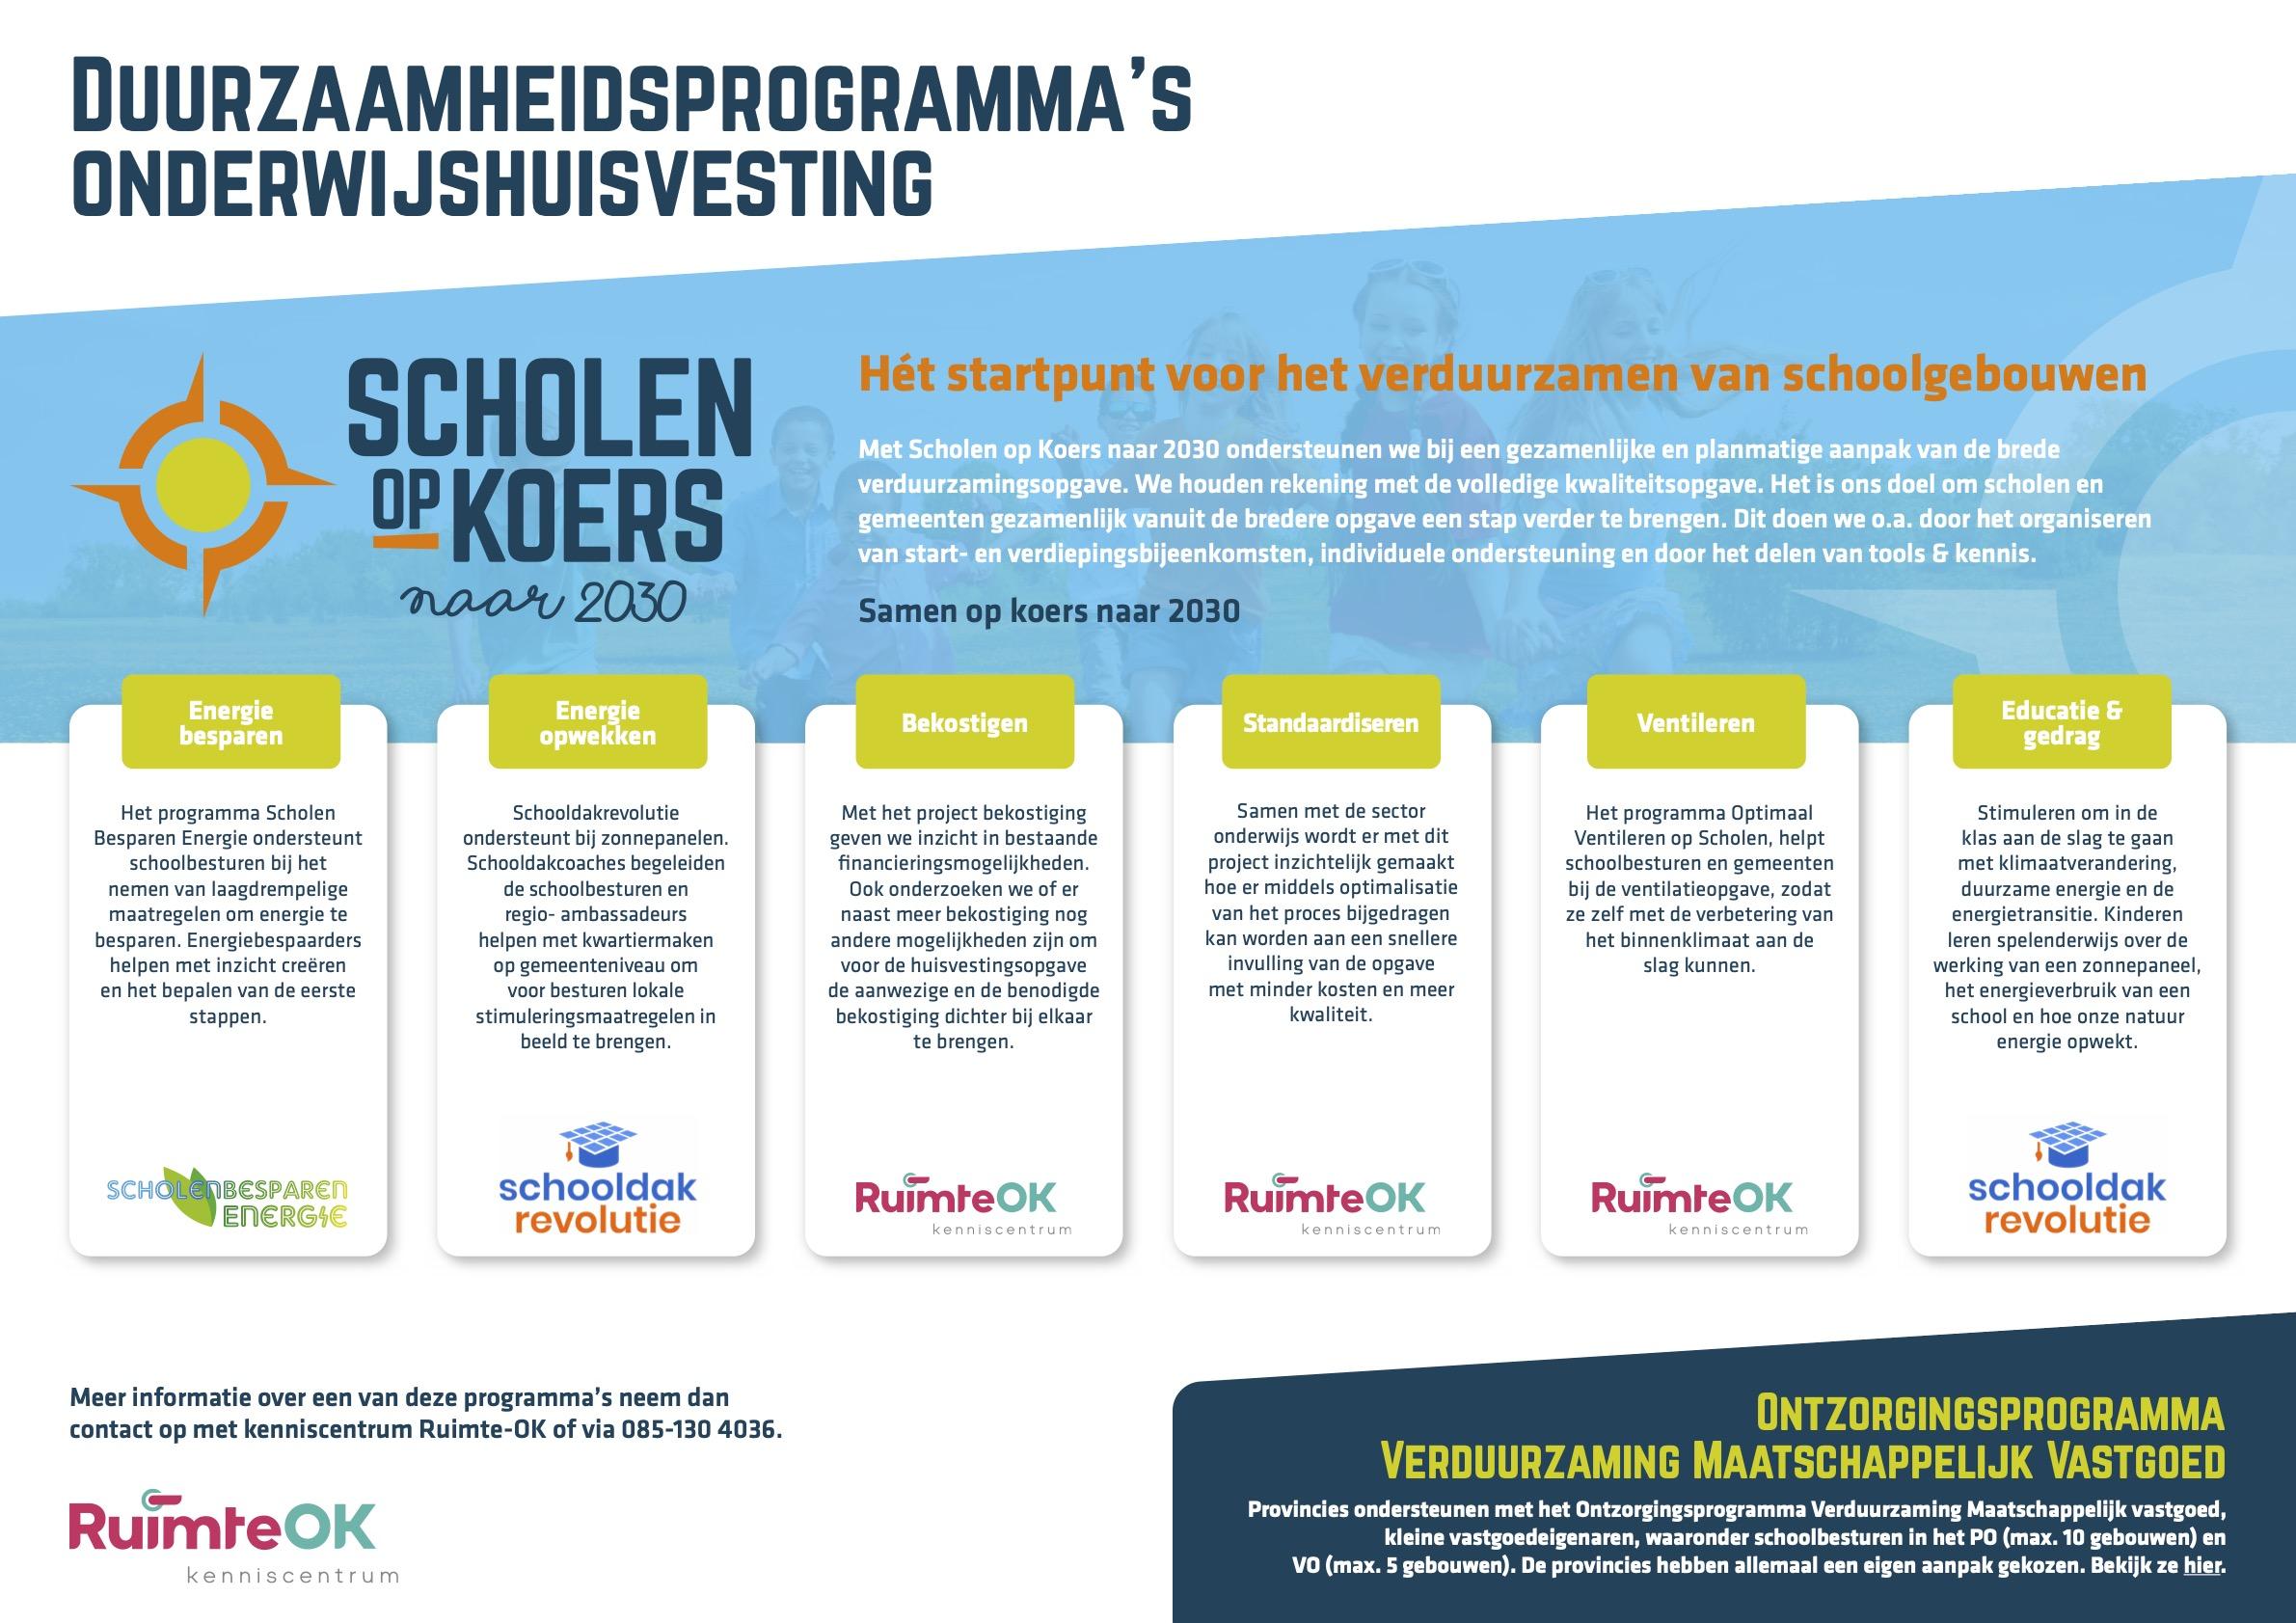 10. Overzicht Duurzaamheidsprogrammas